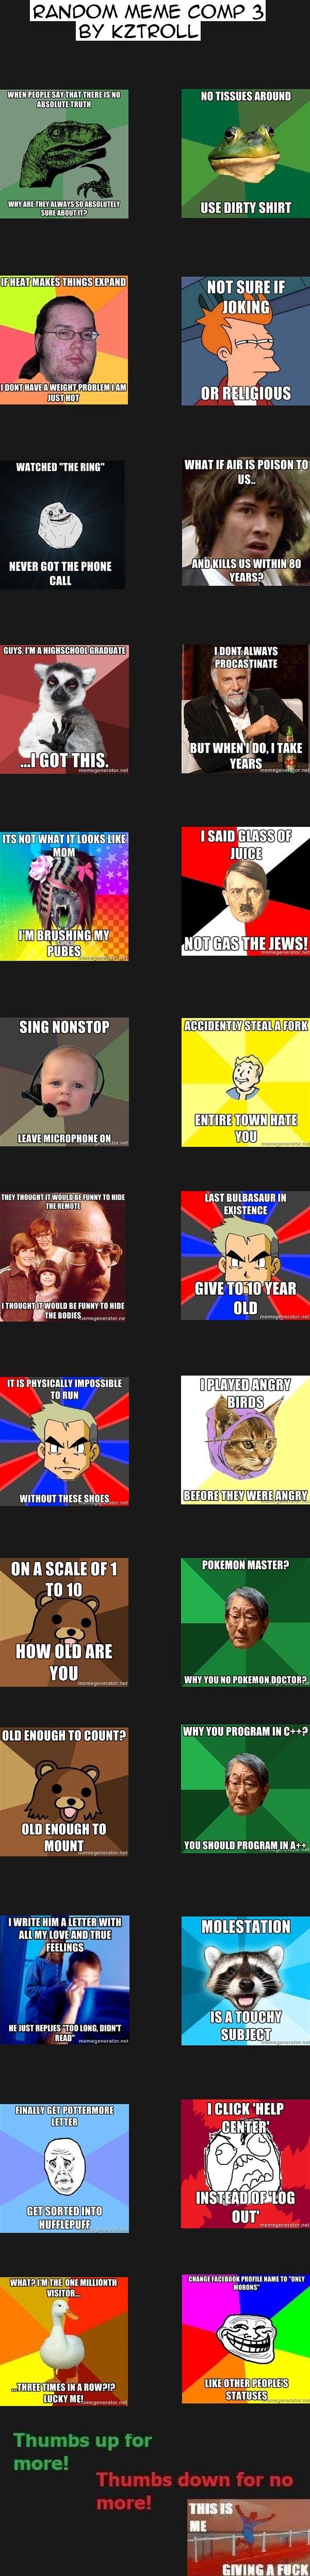 "Random Meme Comp 3. Thumbs and Subscribe for moar comps!!. FANDOM MEME COMP 3 BY KZTROLL WHEN ""ITU Mt ' IS IN mu um um IRWINS "" _ mun sun: nanny It WE NINE"" MIM random meme comp kztroll"